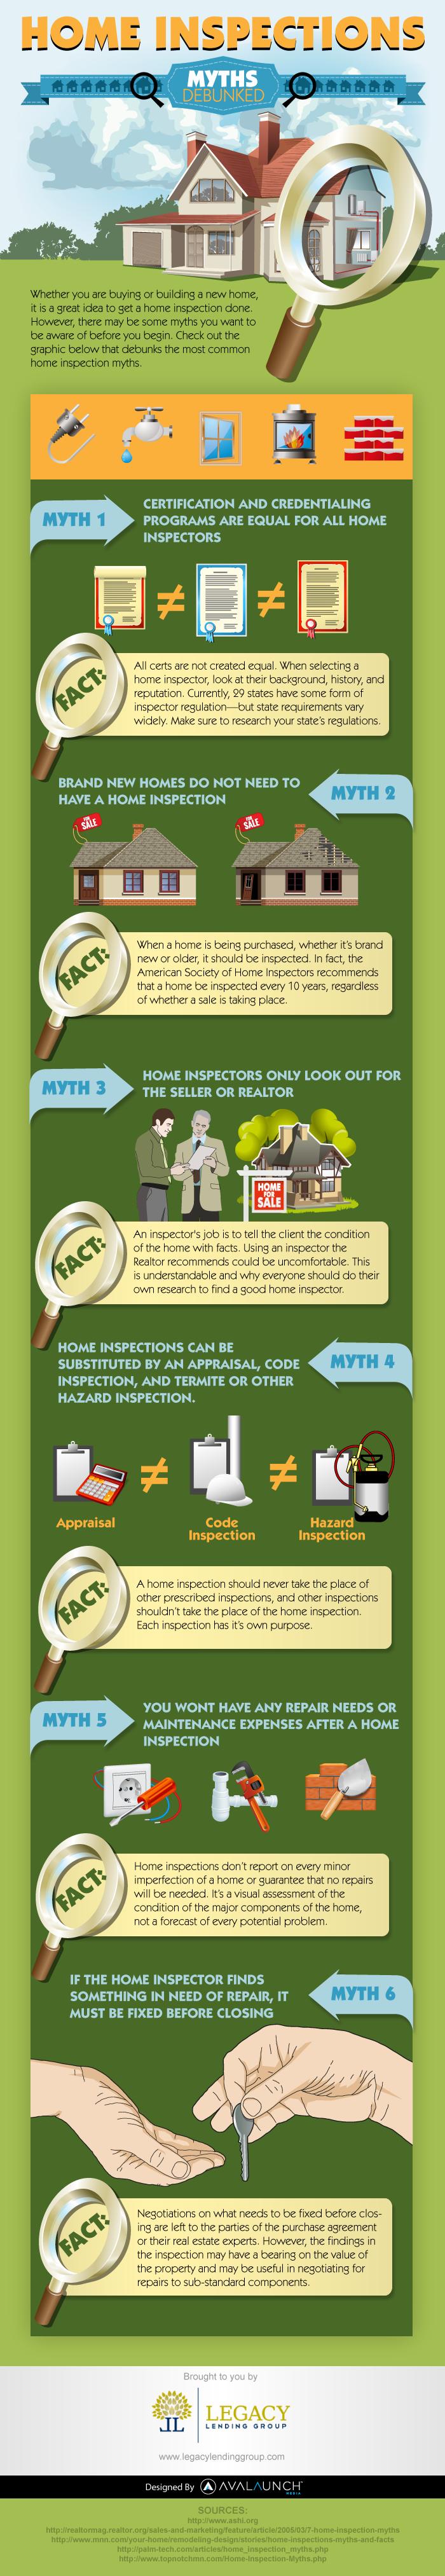 Home Inspection Myths